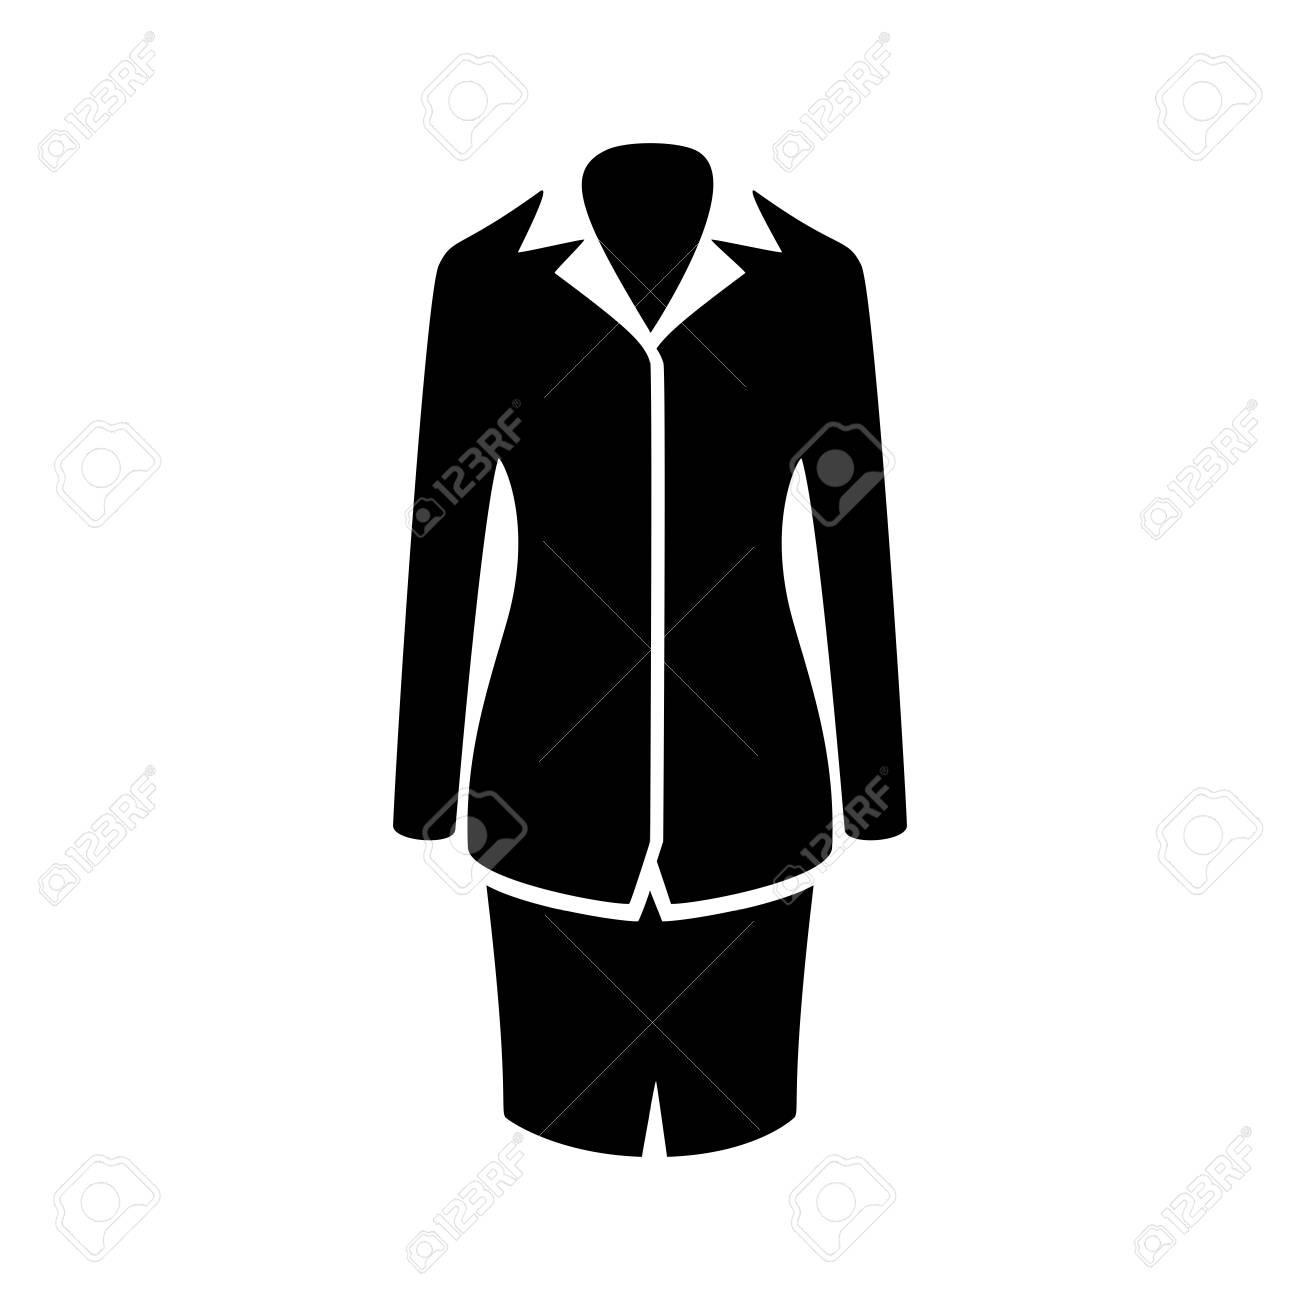 Women suit icon royalty free cliparts vectors and stock women suit icon stock vector 45755592 publicscrutiny Gallery